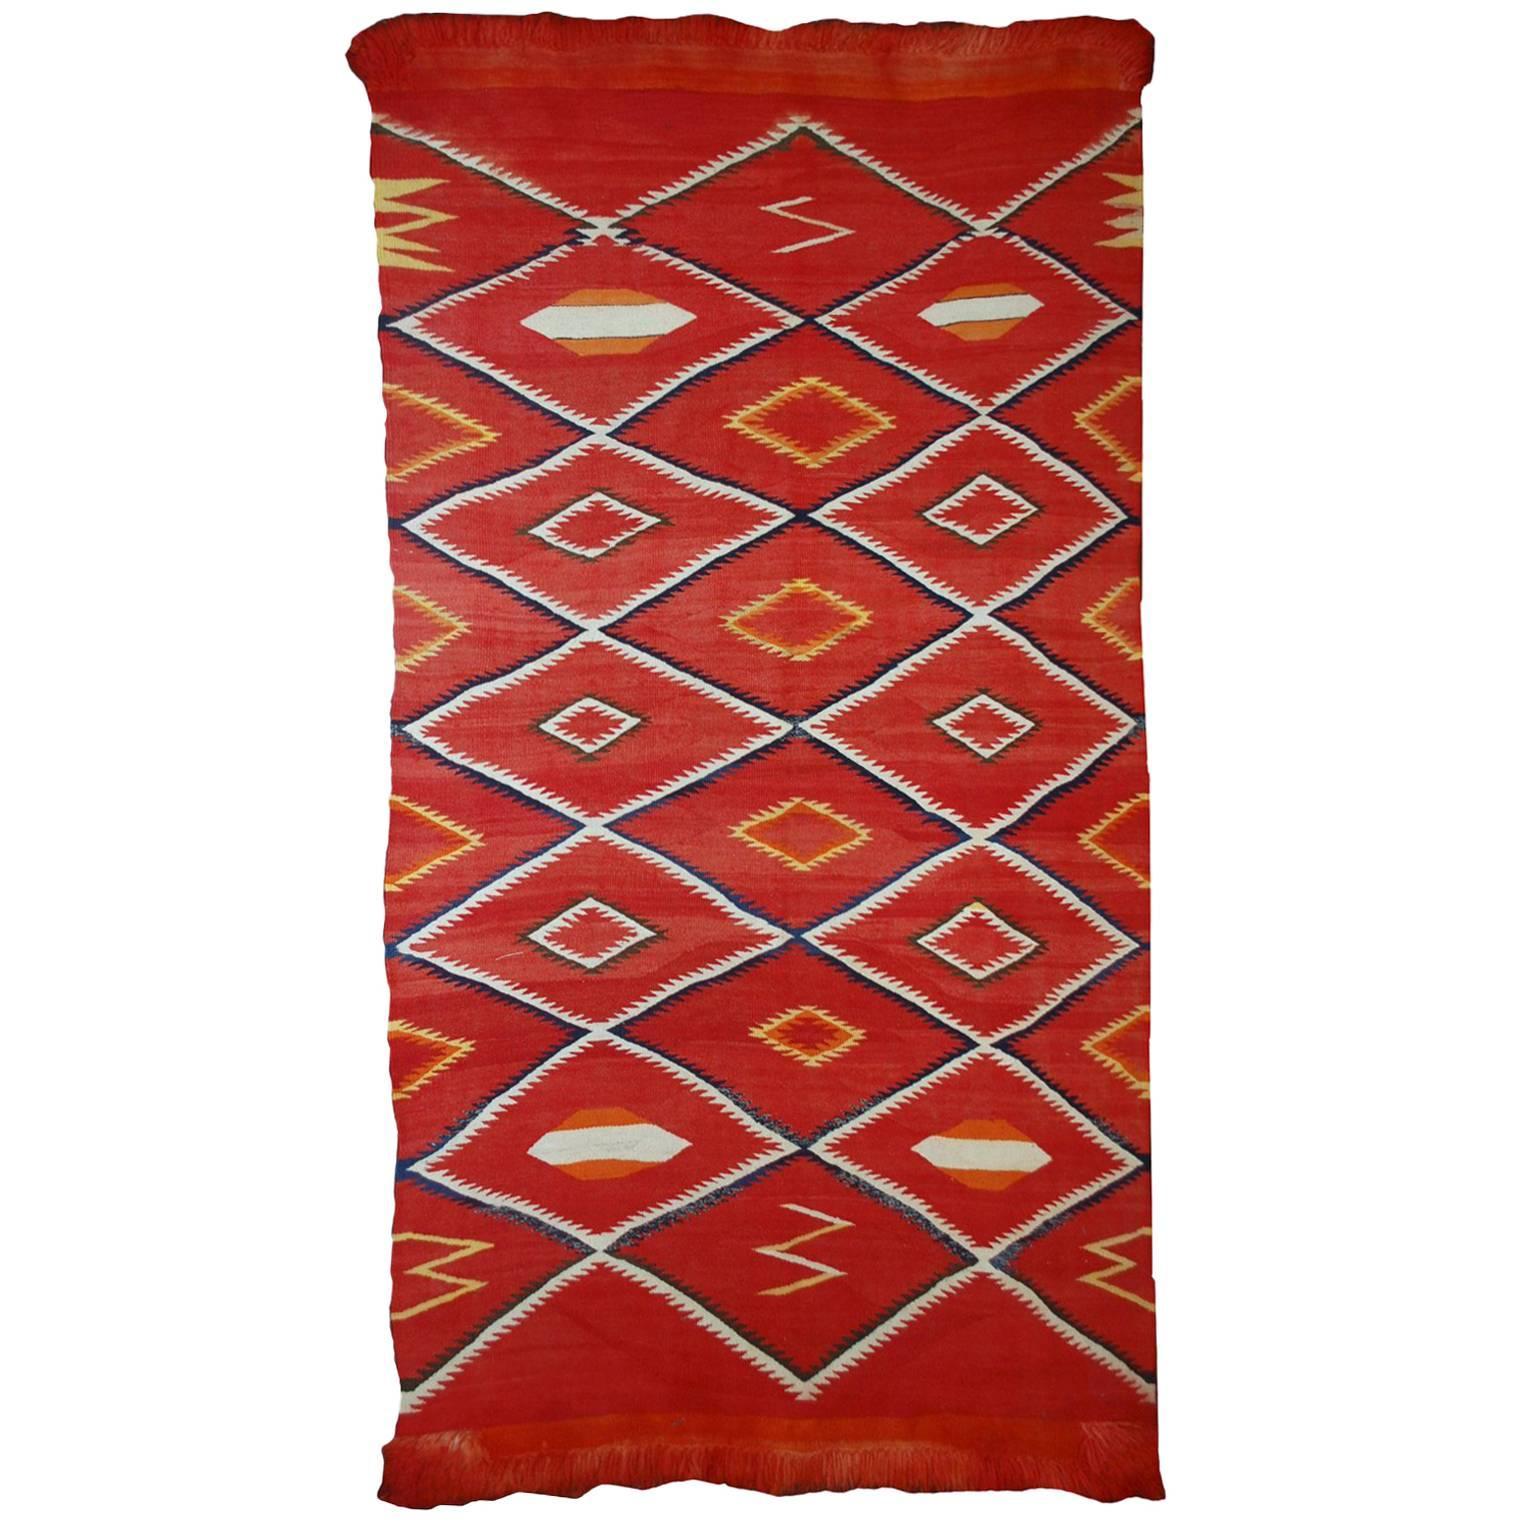 Handmade Antique Collectible Native American Navajo Blanket, 1870s, 1B557